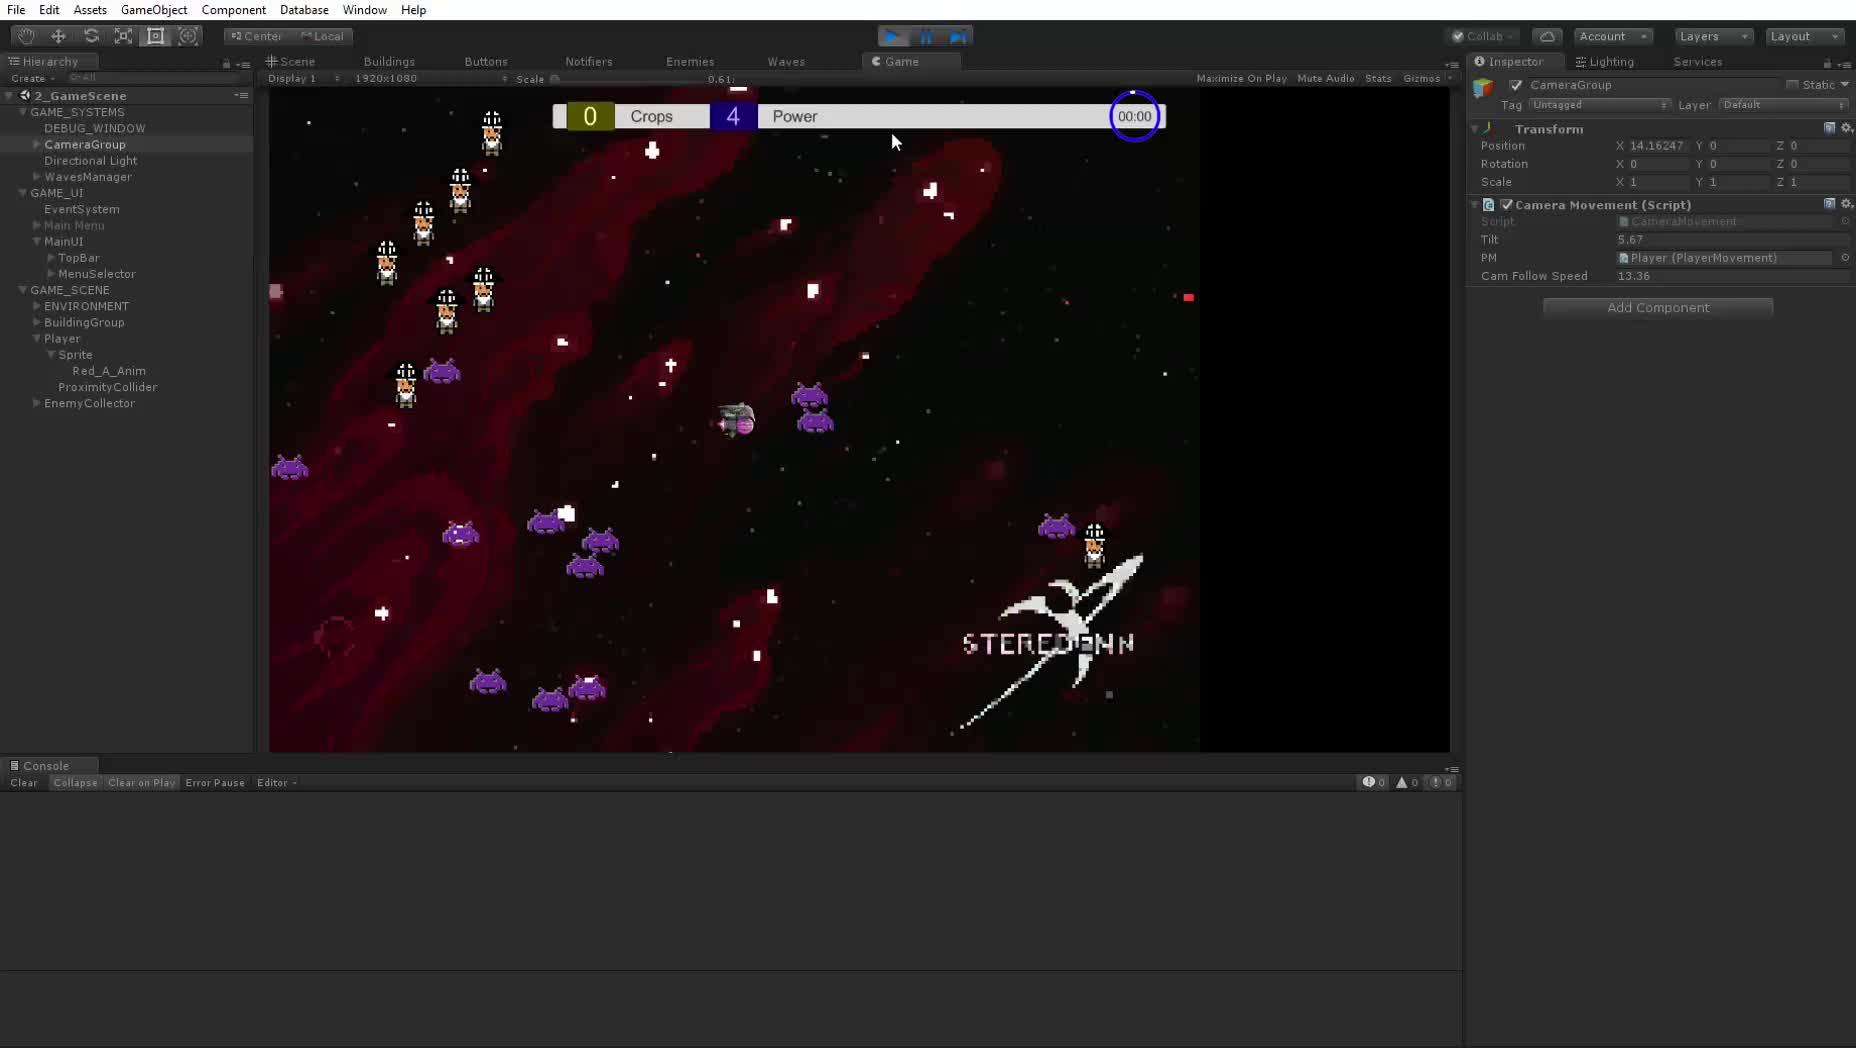 Unity 2017.3.1f1 Personal (64bit) - 2 GameScene.unity - FarmingInSpace - PC, Mac & Linux Standalone DX11  25 05 2018 03 53 54 GIFs